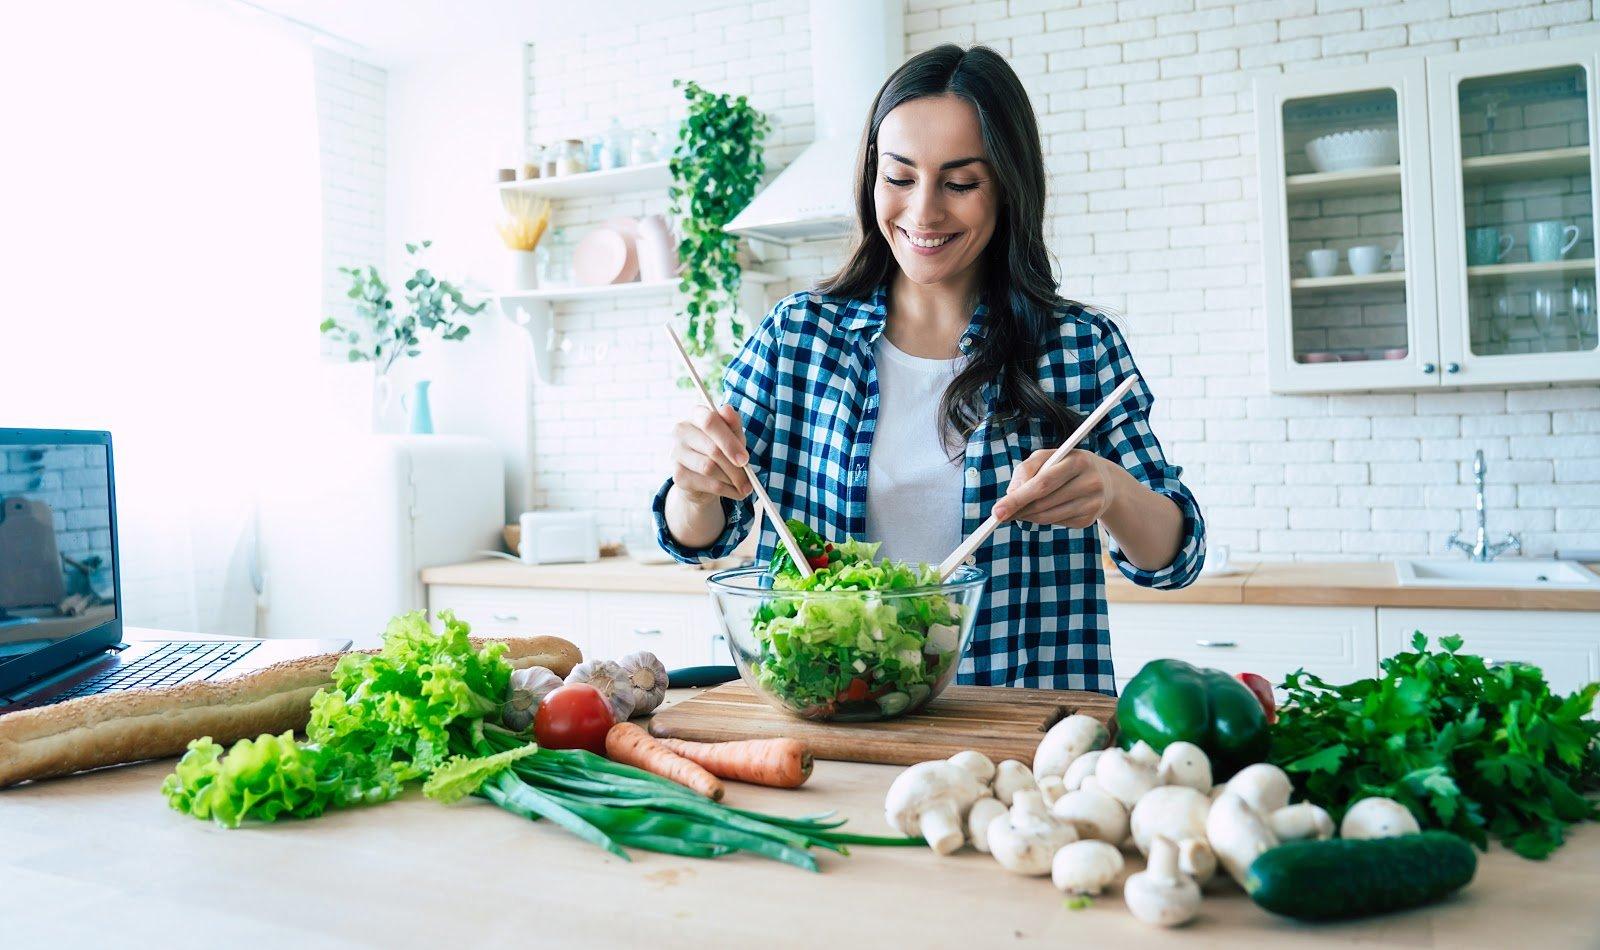 ibs diet: woman preparing vegetable salad in the kitchen